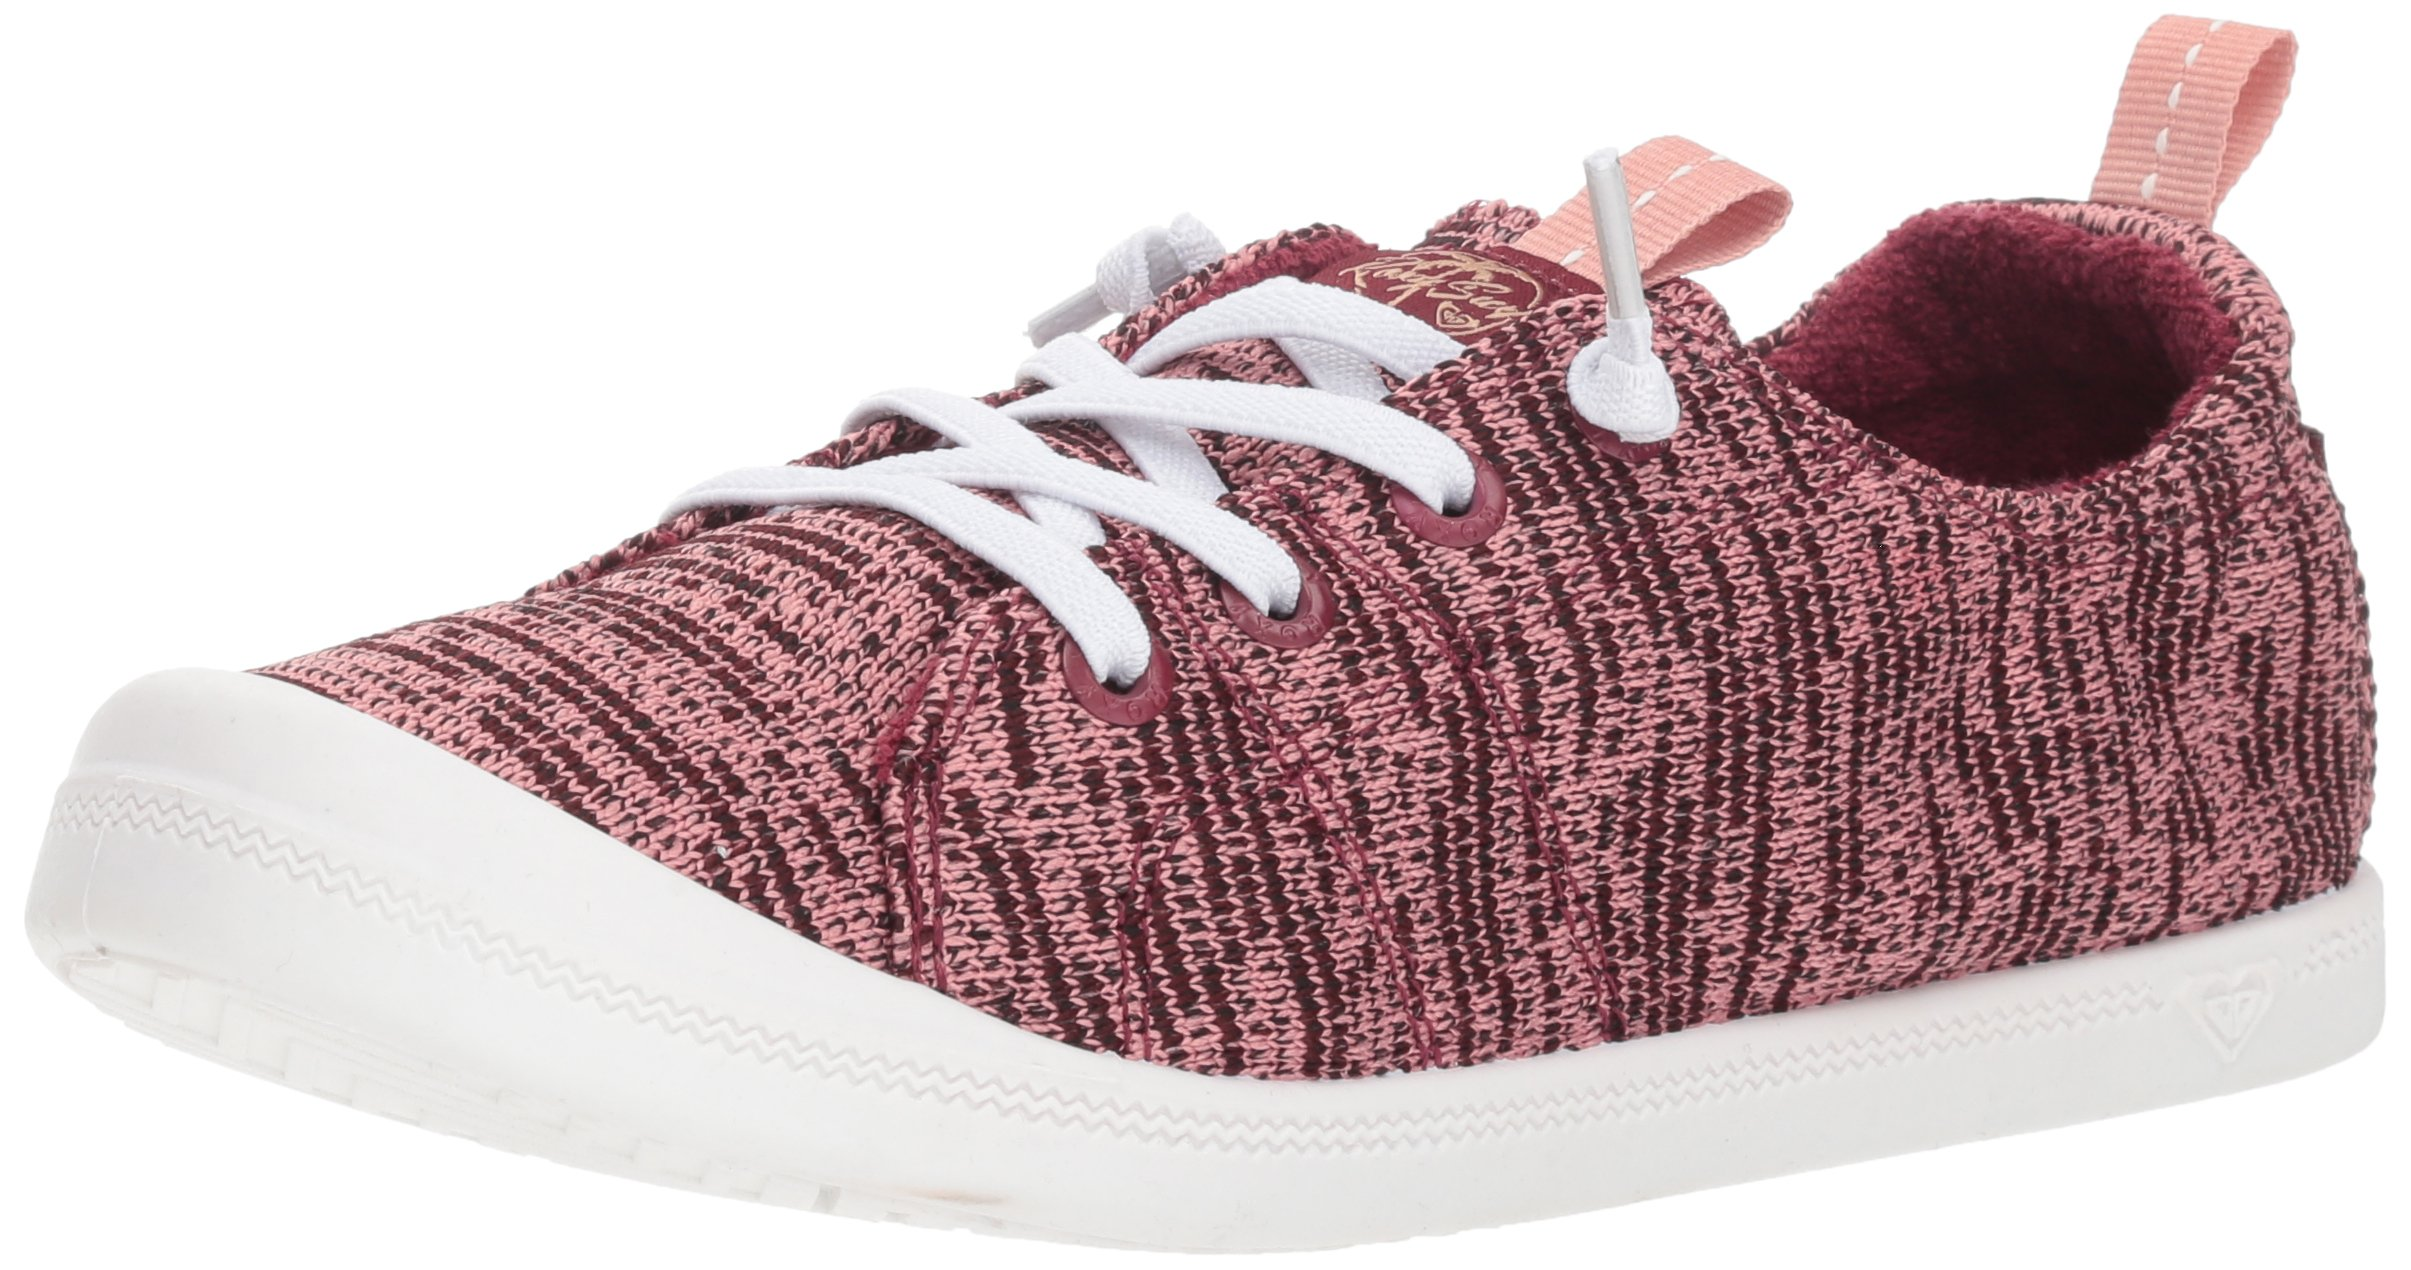 Roxy Women's Bayshore Sport Slip on Shoe Fashion Sneaker, Burgundy, 5 M US by Roxy (Image #1)